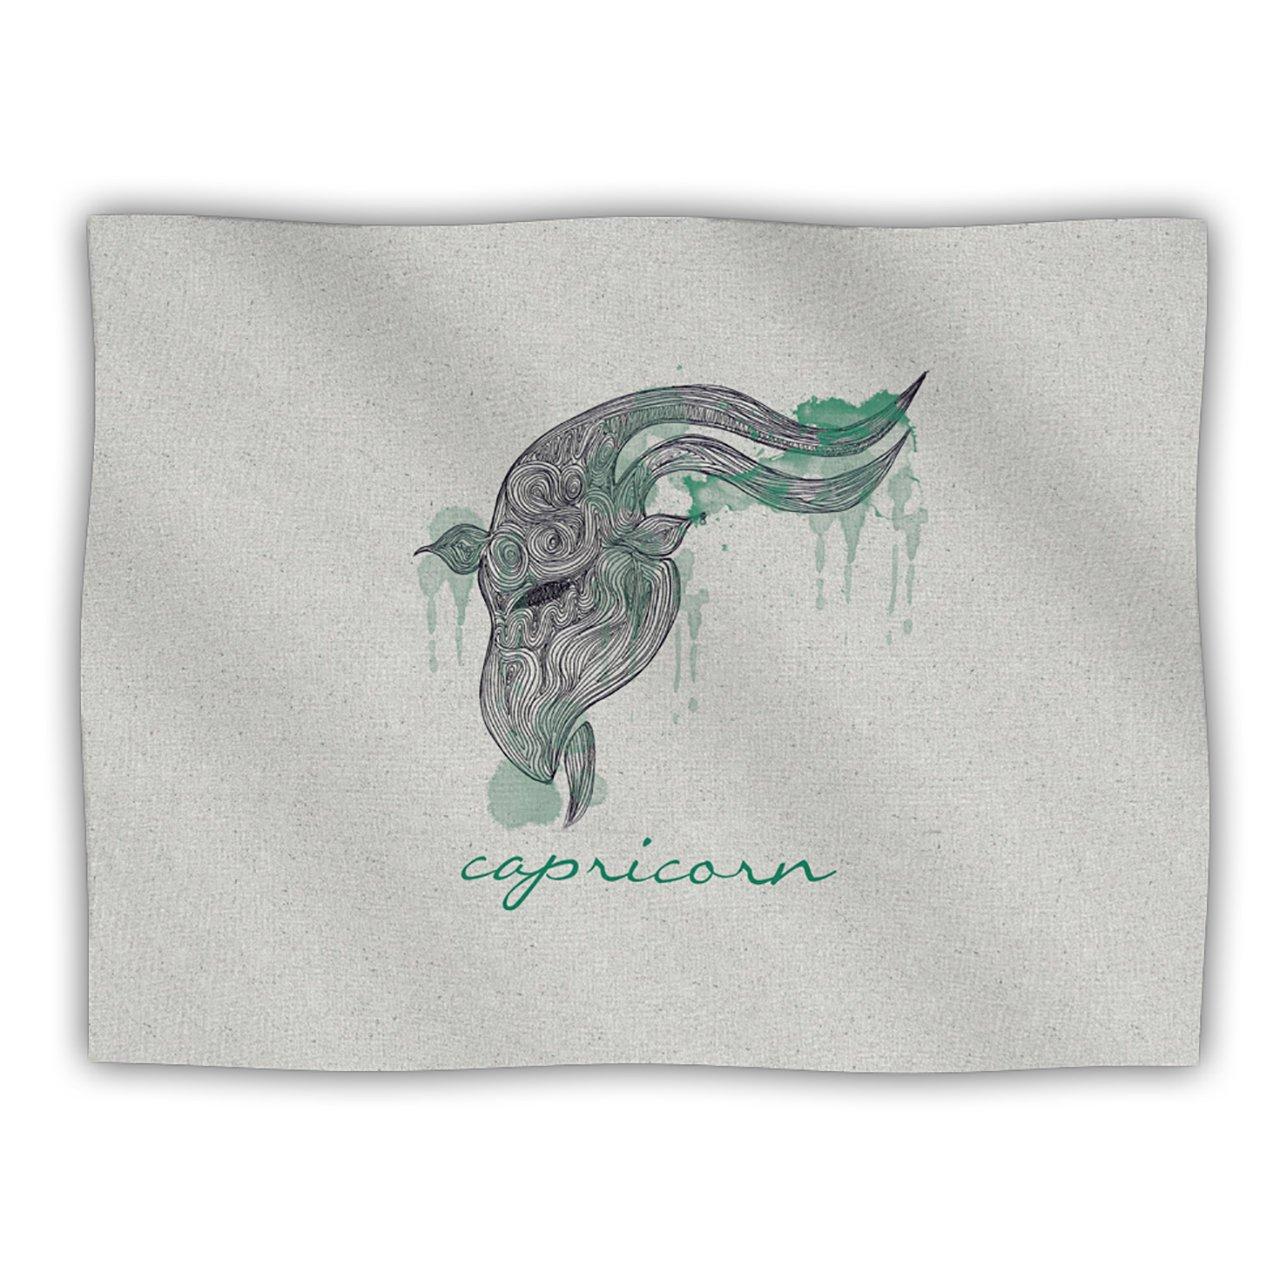 Kess InHouse Belinda Gillies Capricorn  Pet Blanket, 40 by 30-Inch